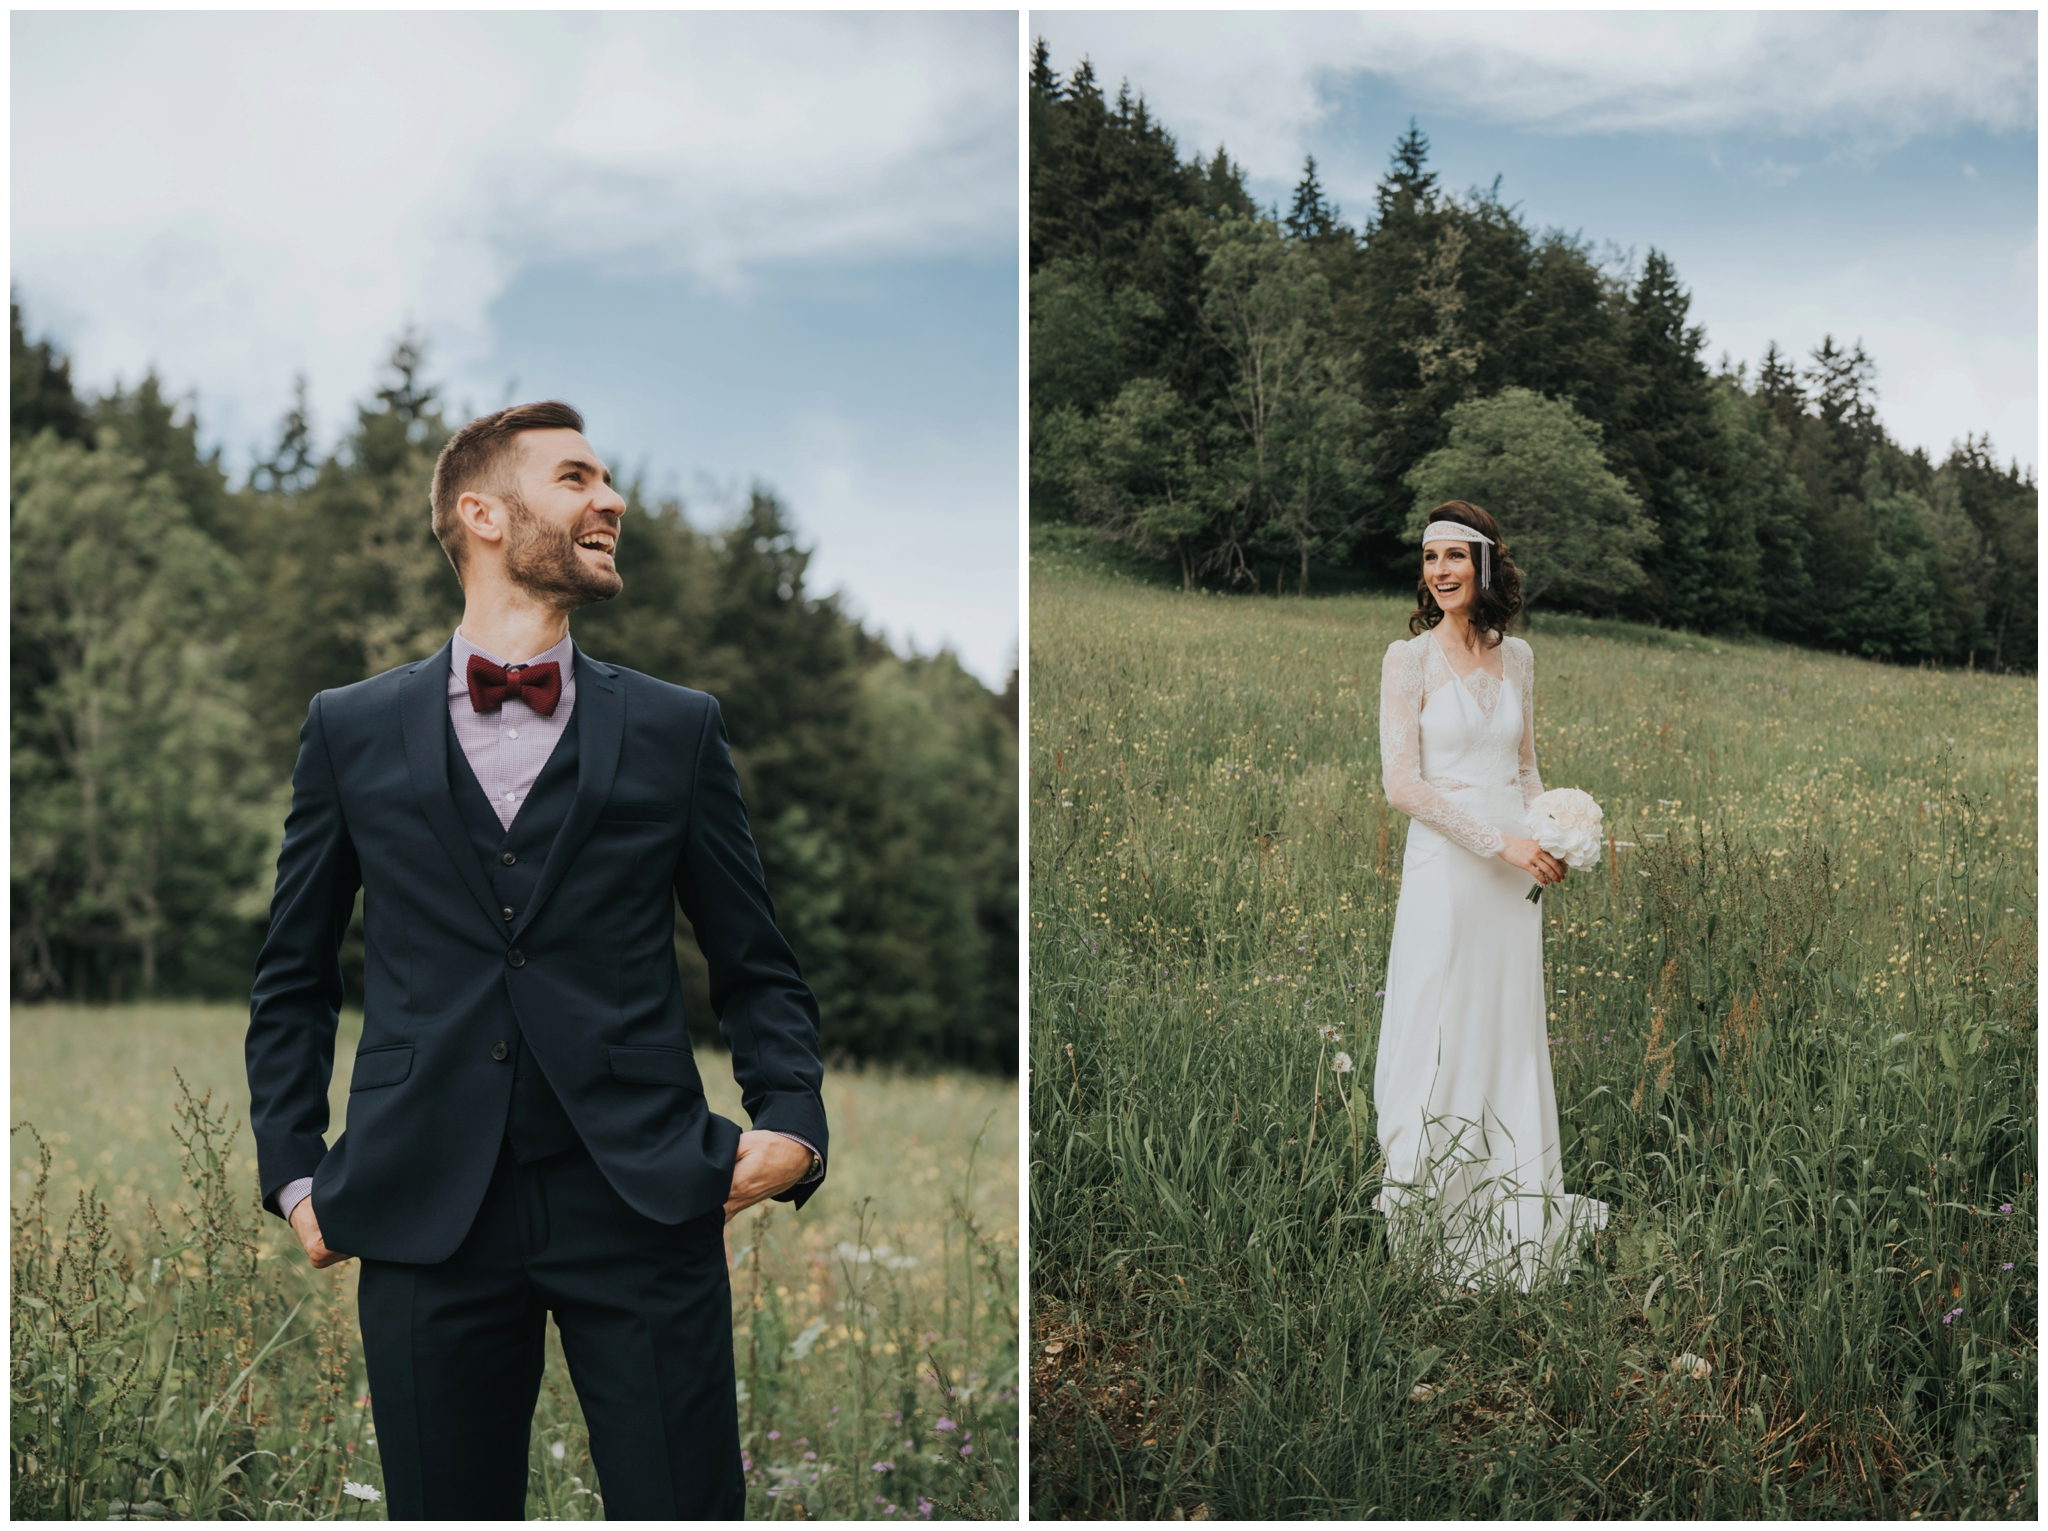 photographe-mariage-montagne-vercors-boho-folk-grenoble-annecy-alpes_0037